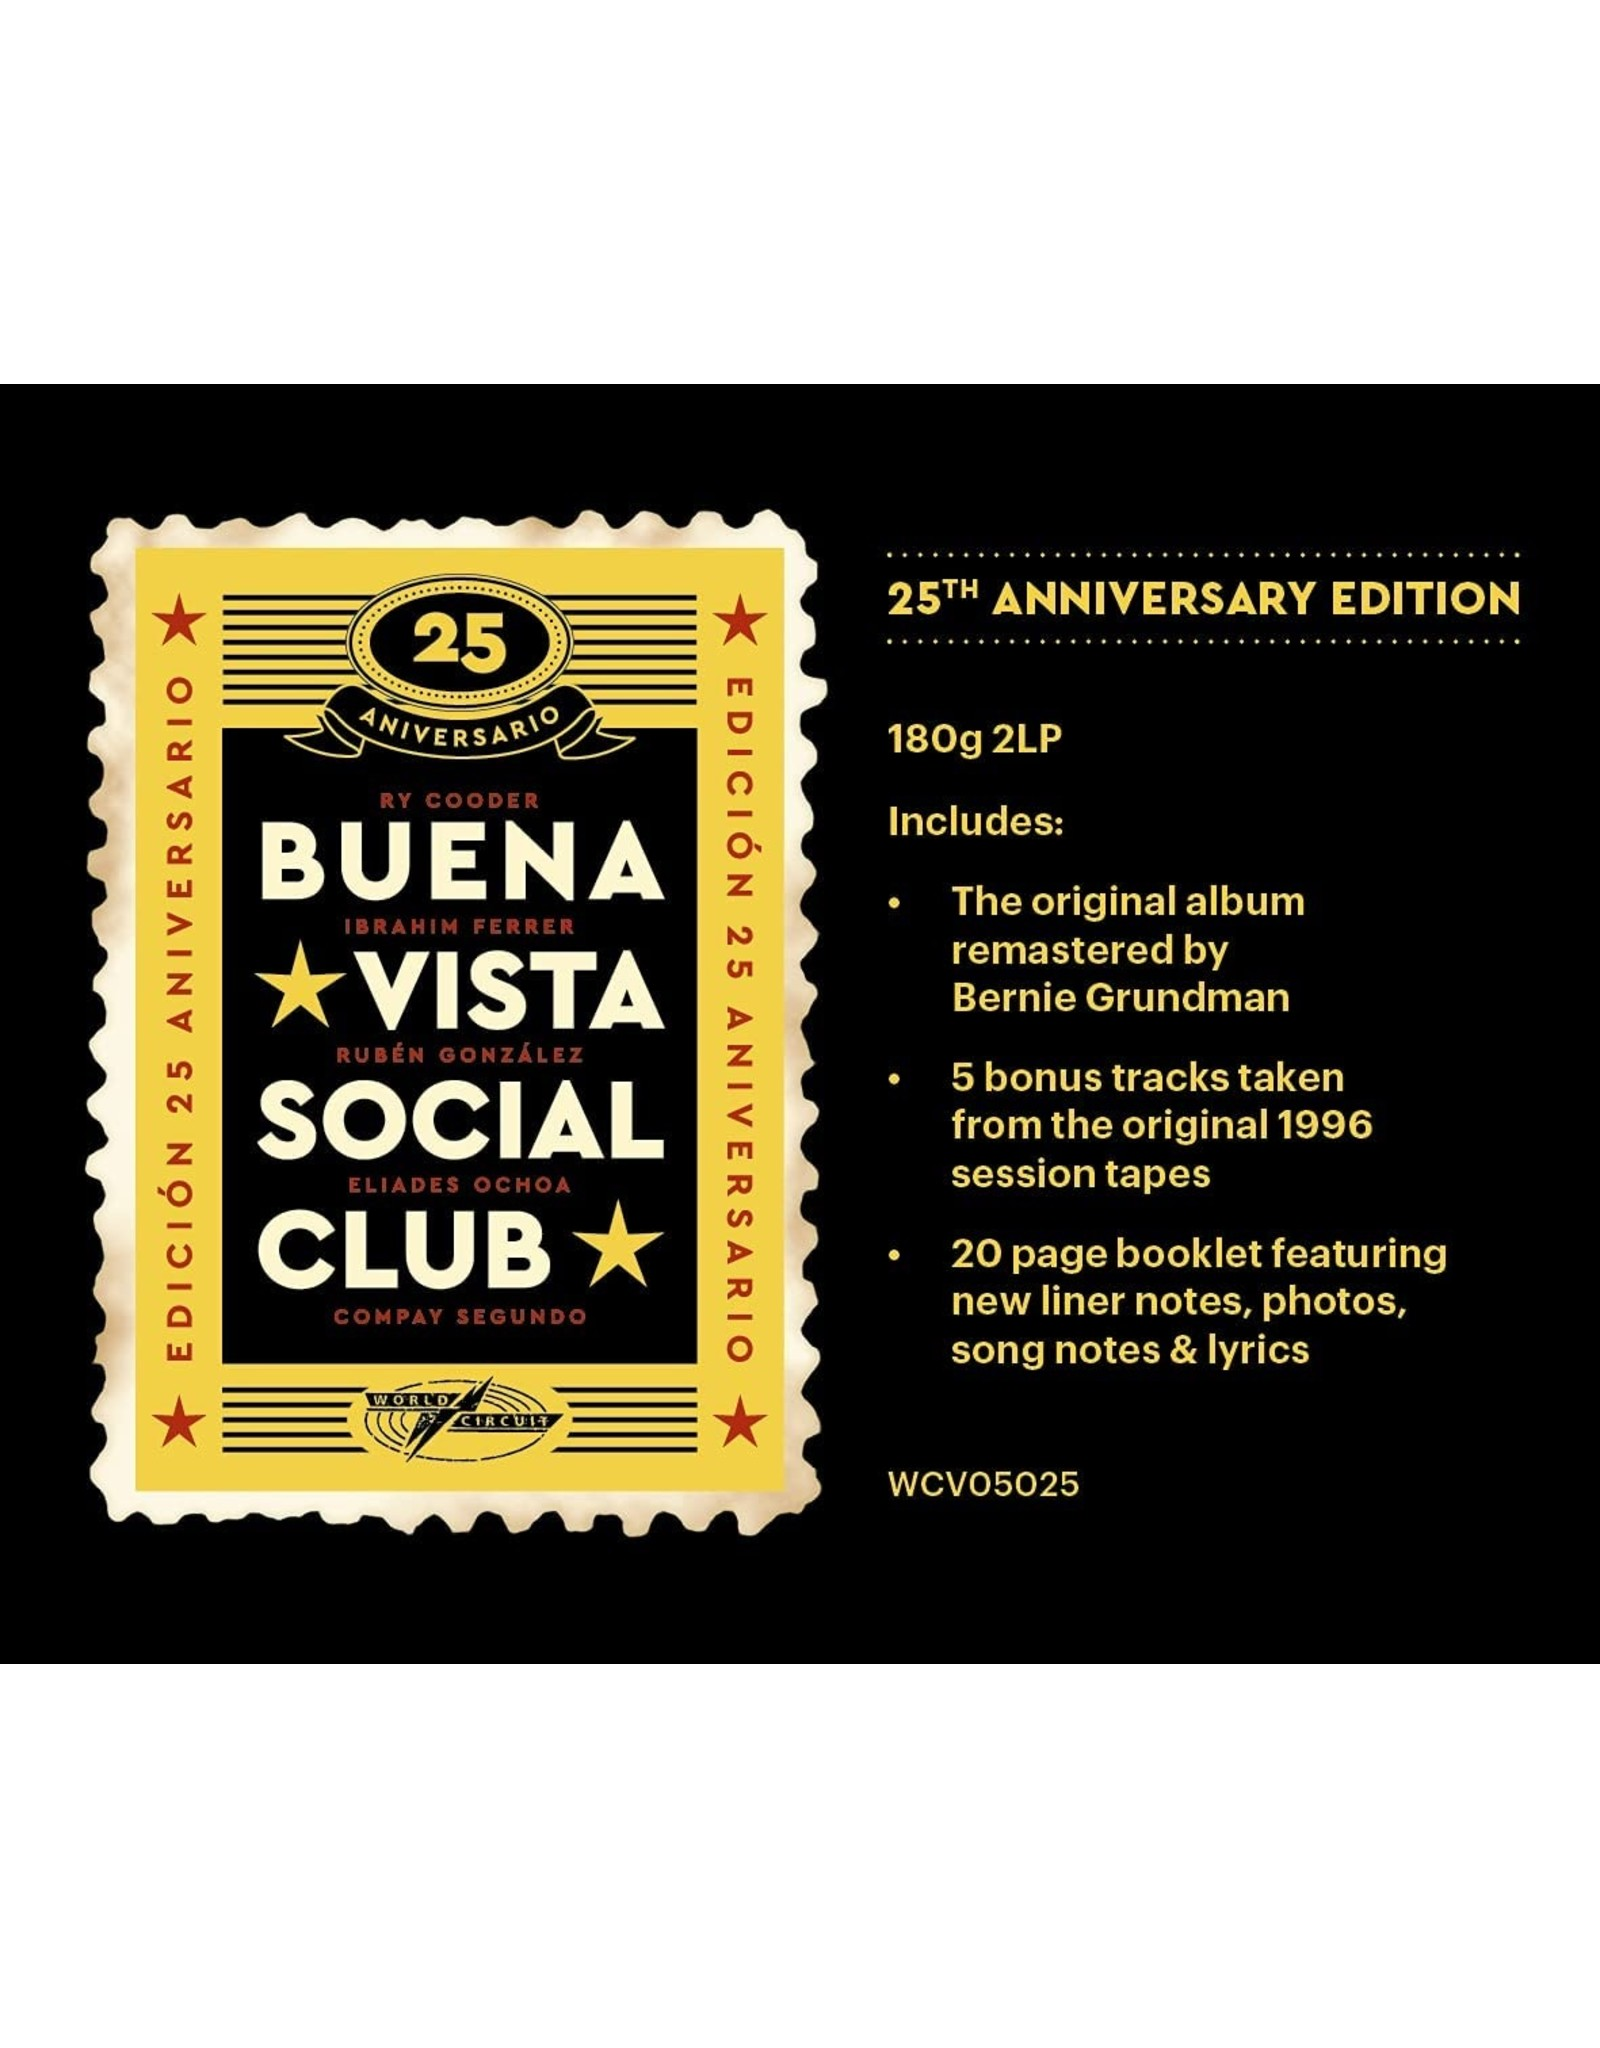 Buena Vista Social Club - Buena Vista Social Club (25th Anniversary)